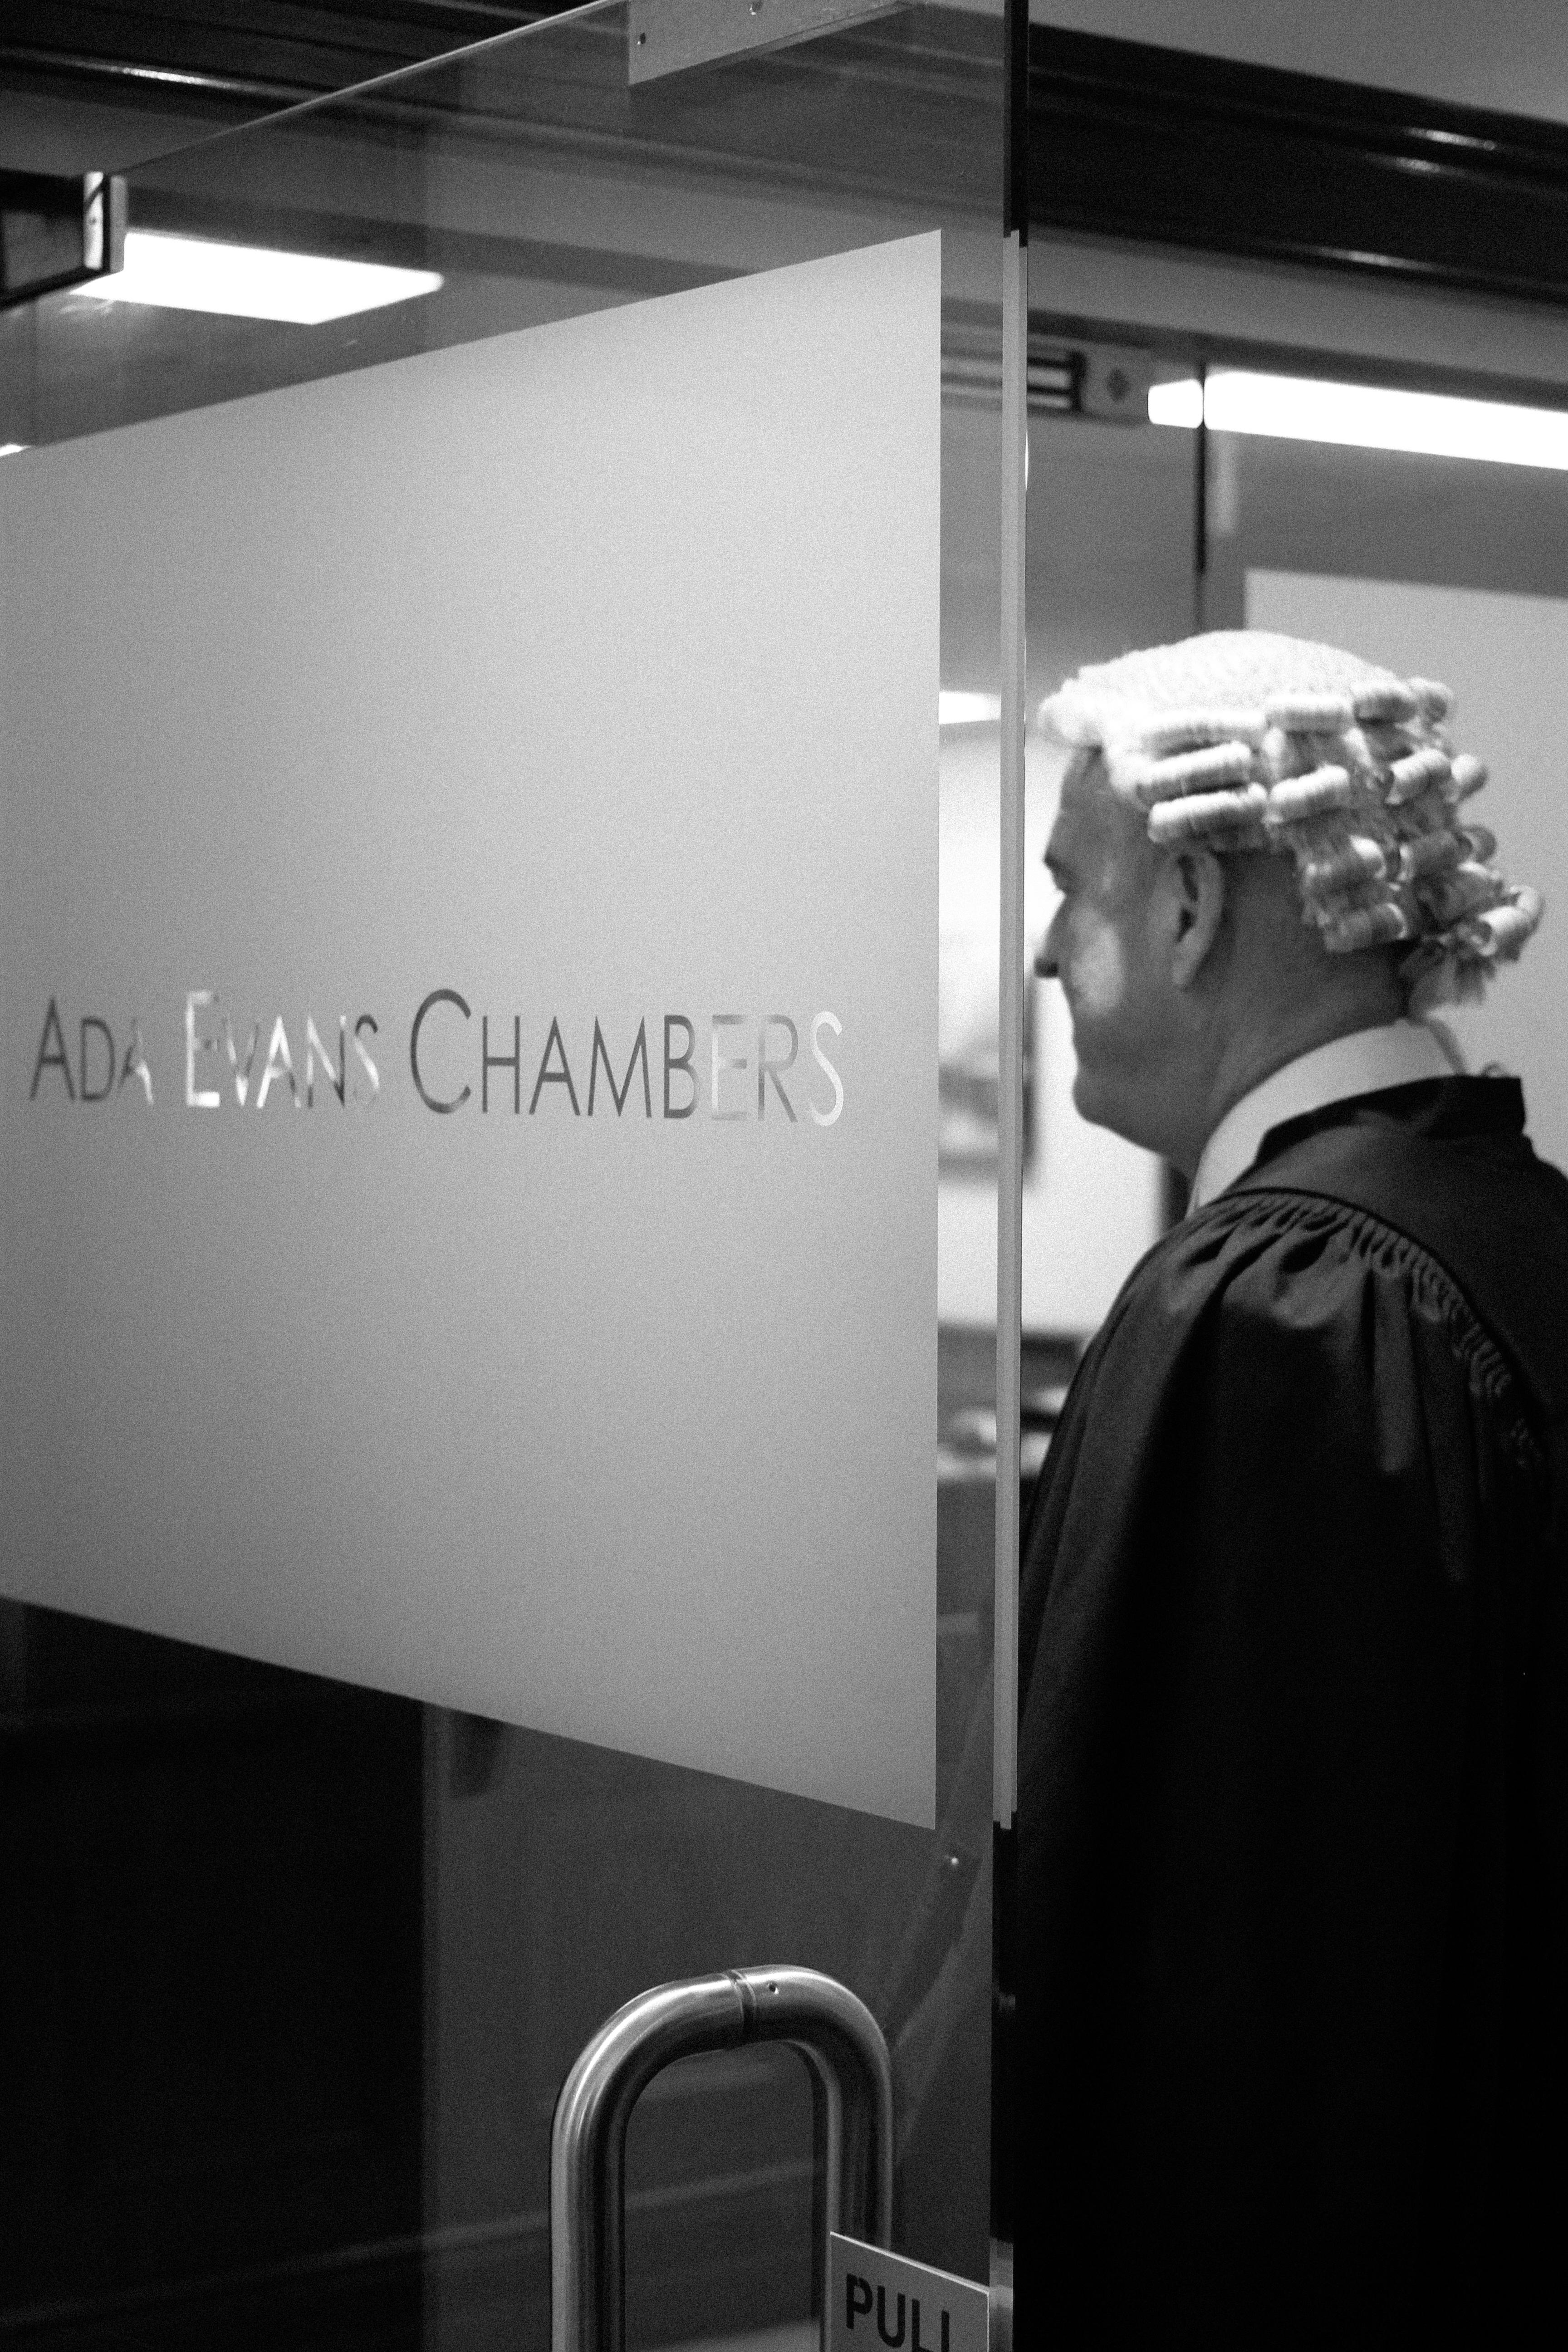 chambers (5 of 5)